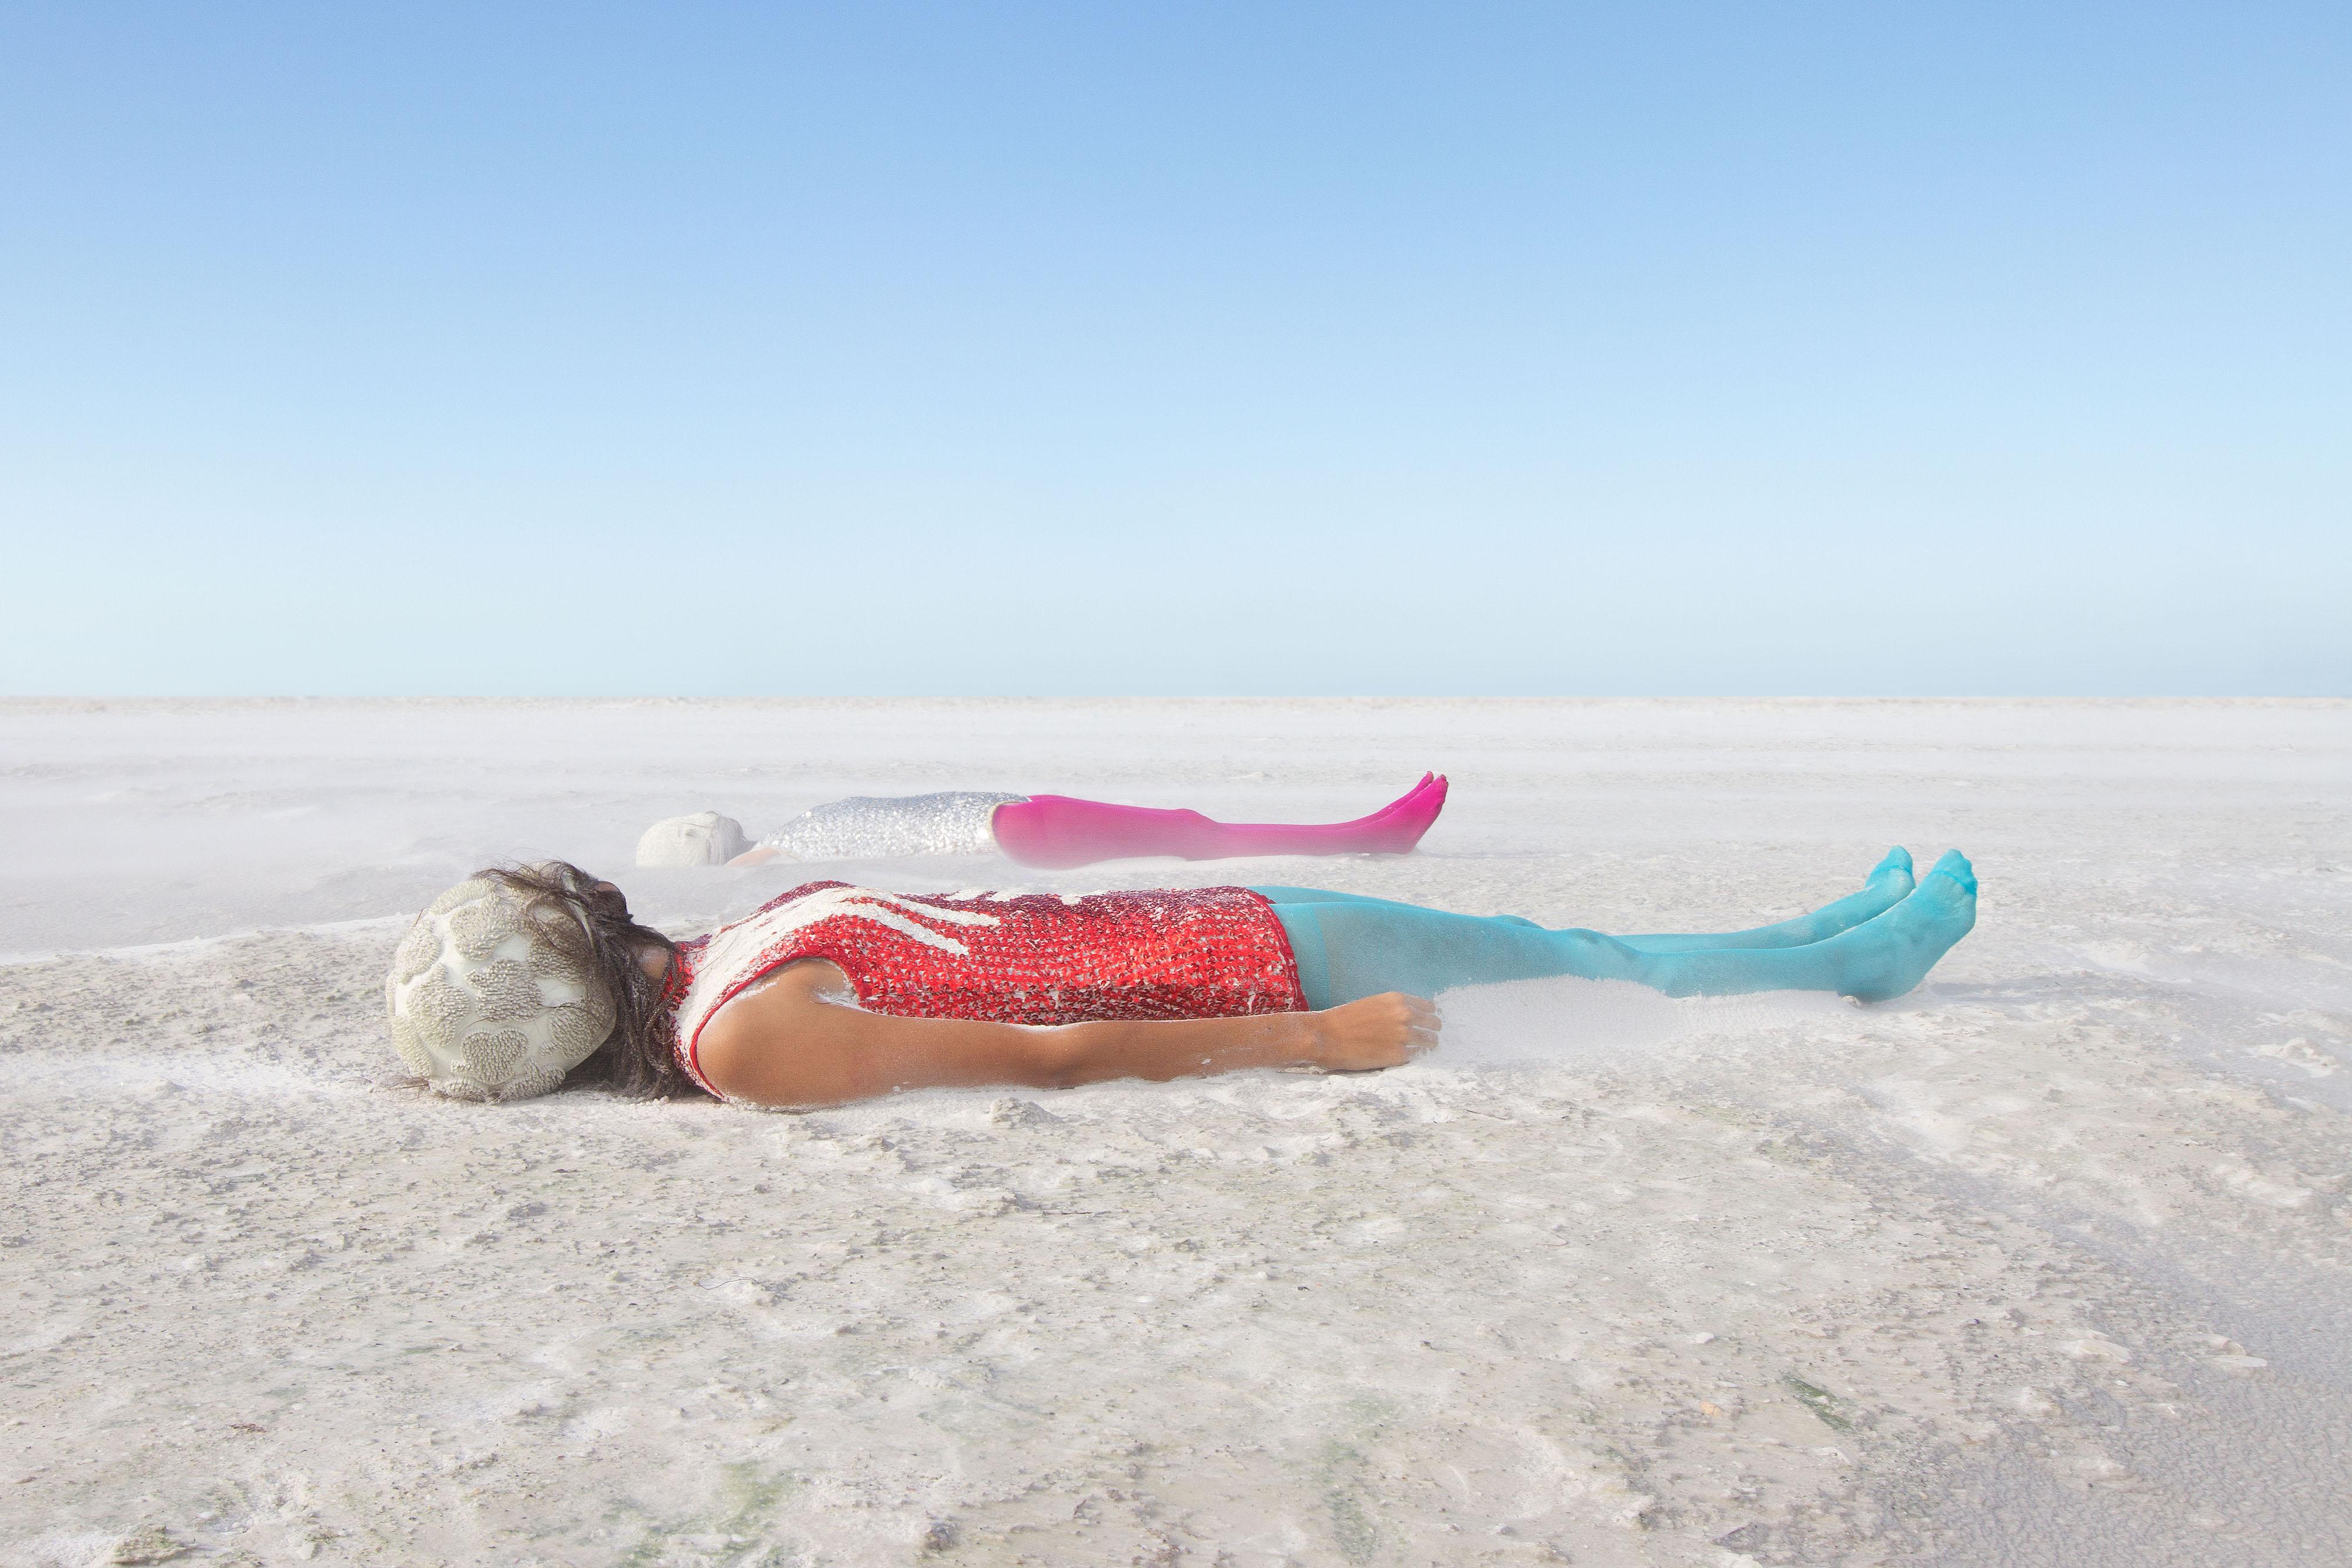 Selina Roman - Untitled (Sand), 2012